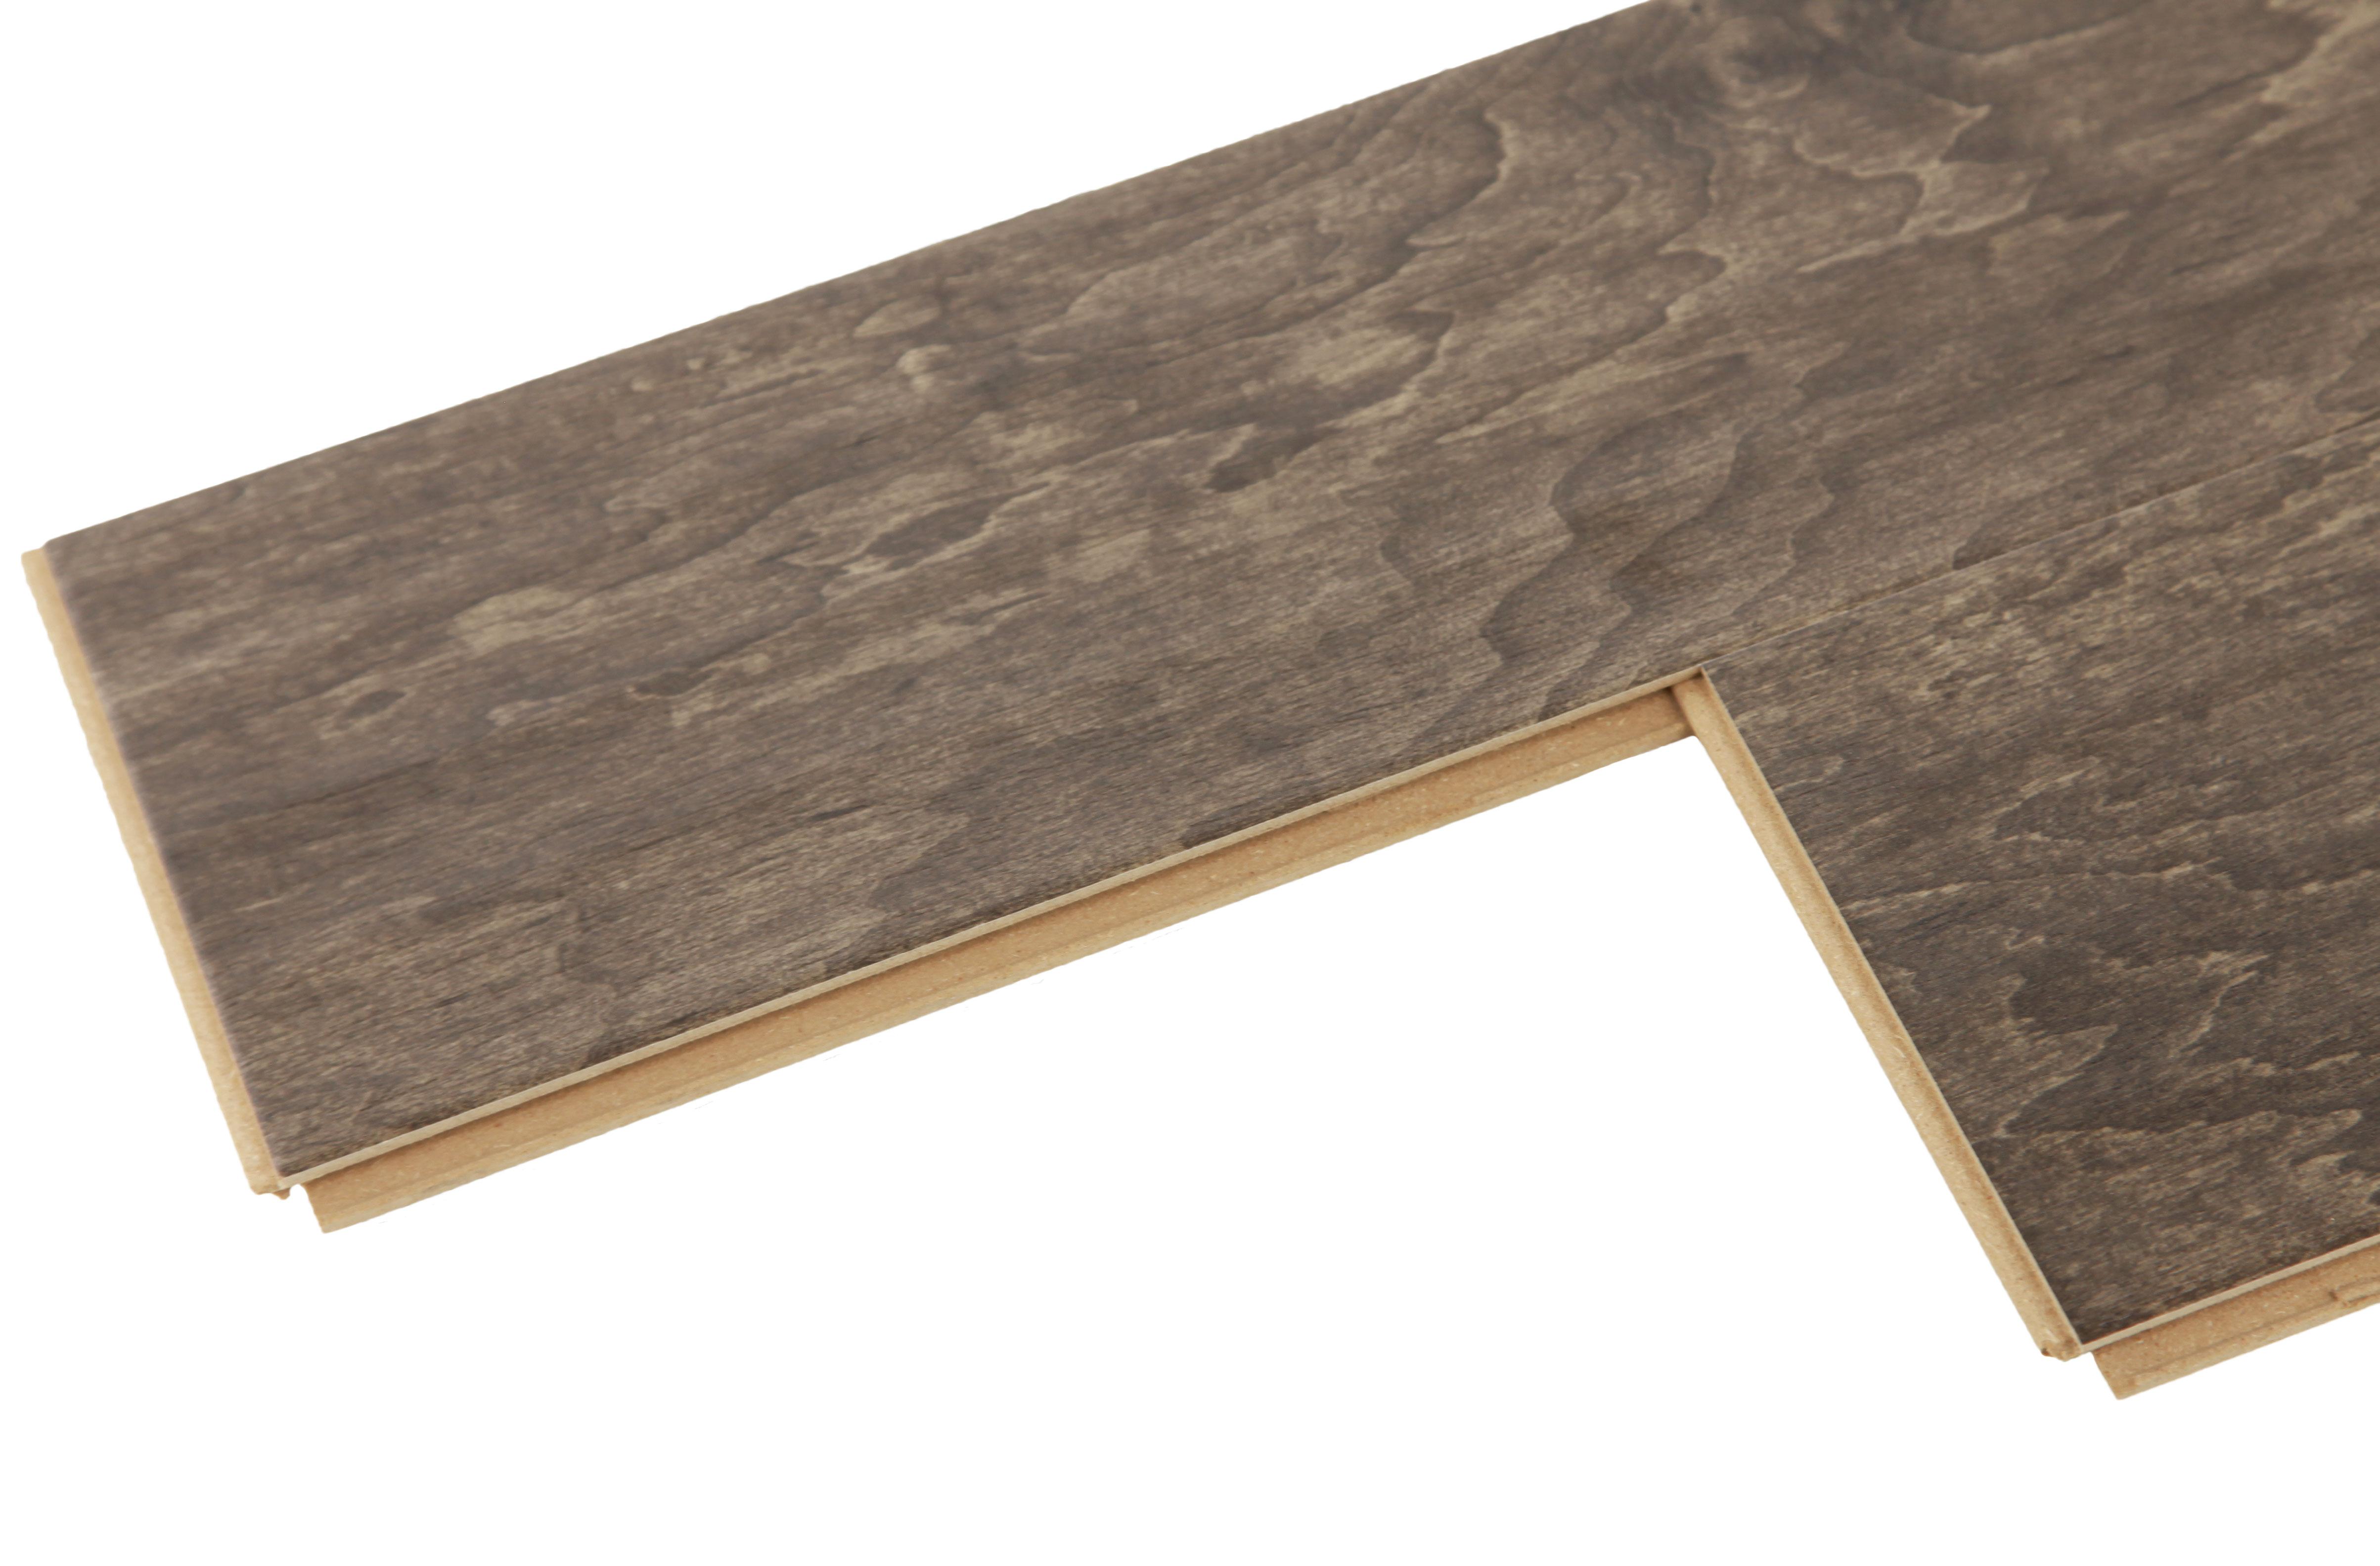 Mega clic baroque wood look and feel laminate flooring for Clic laminate flooring